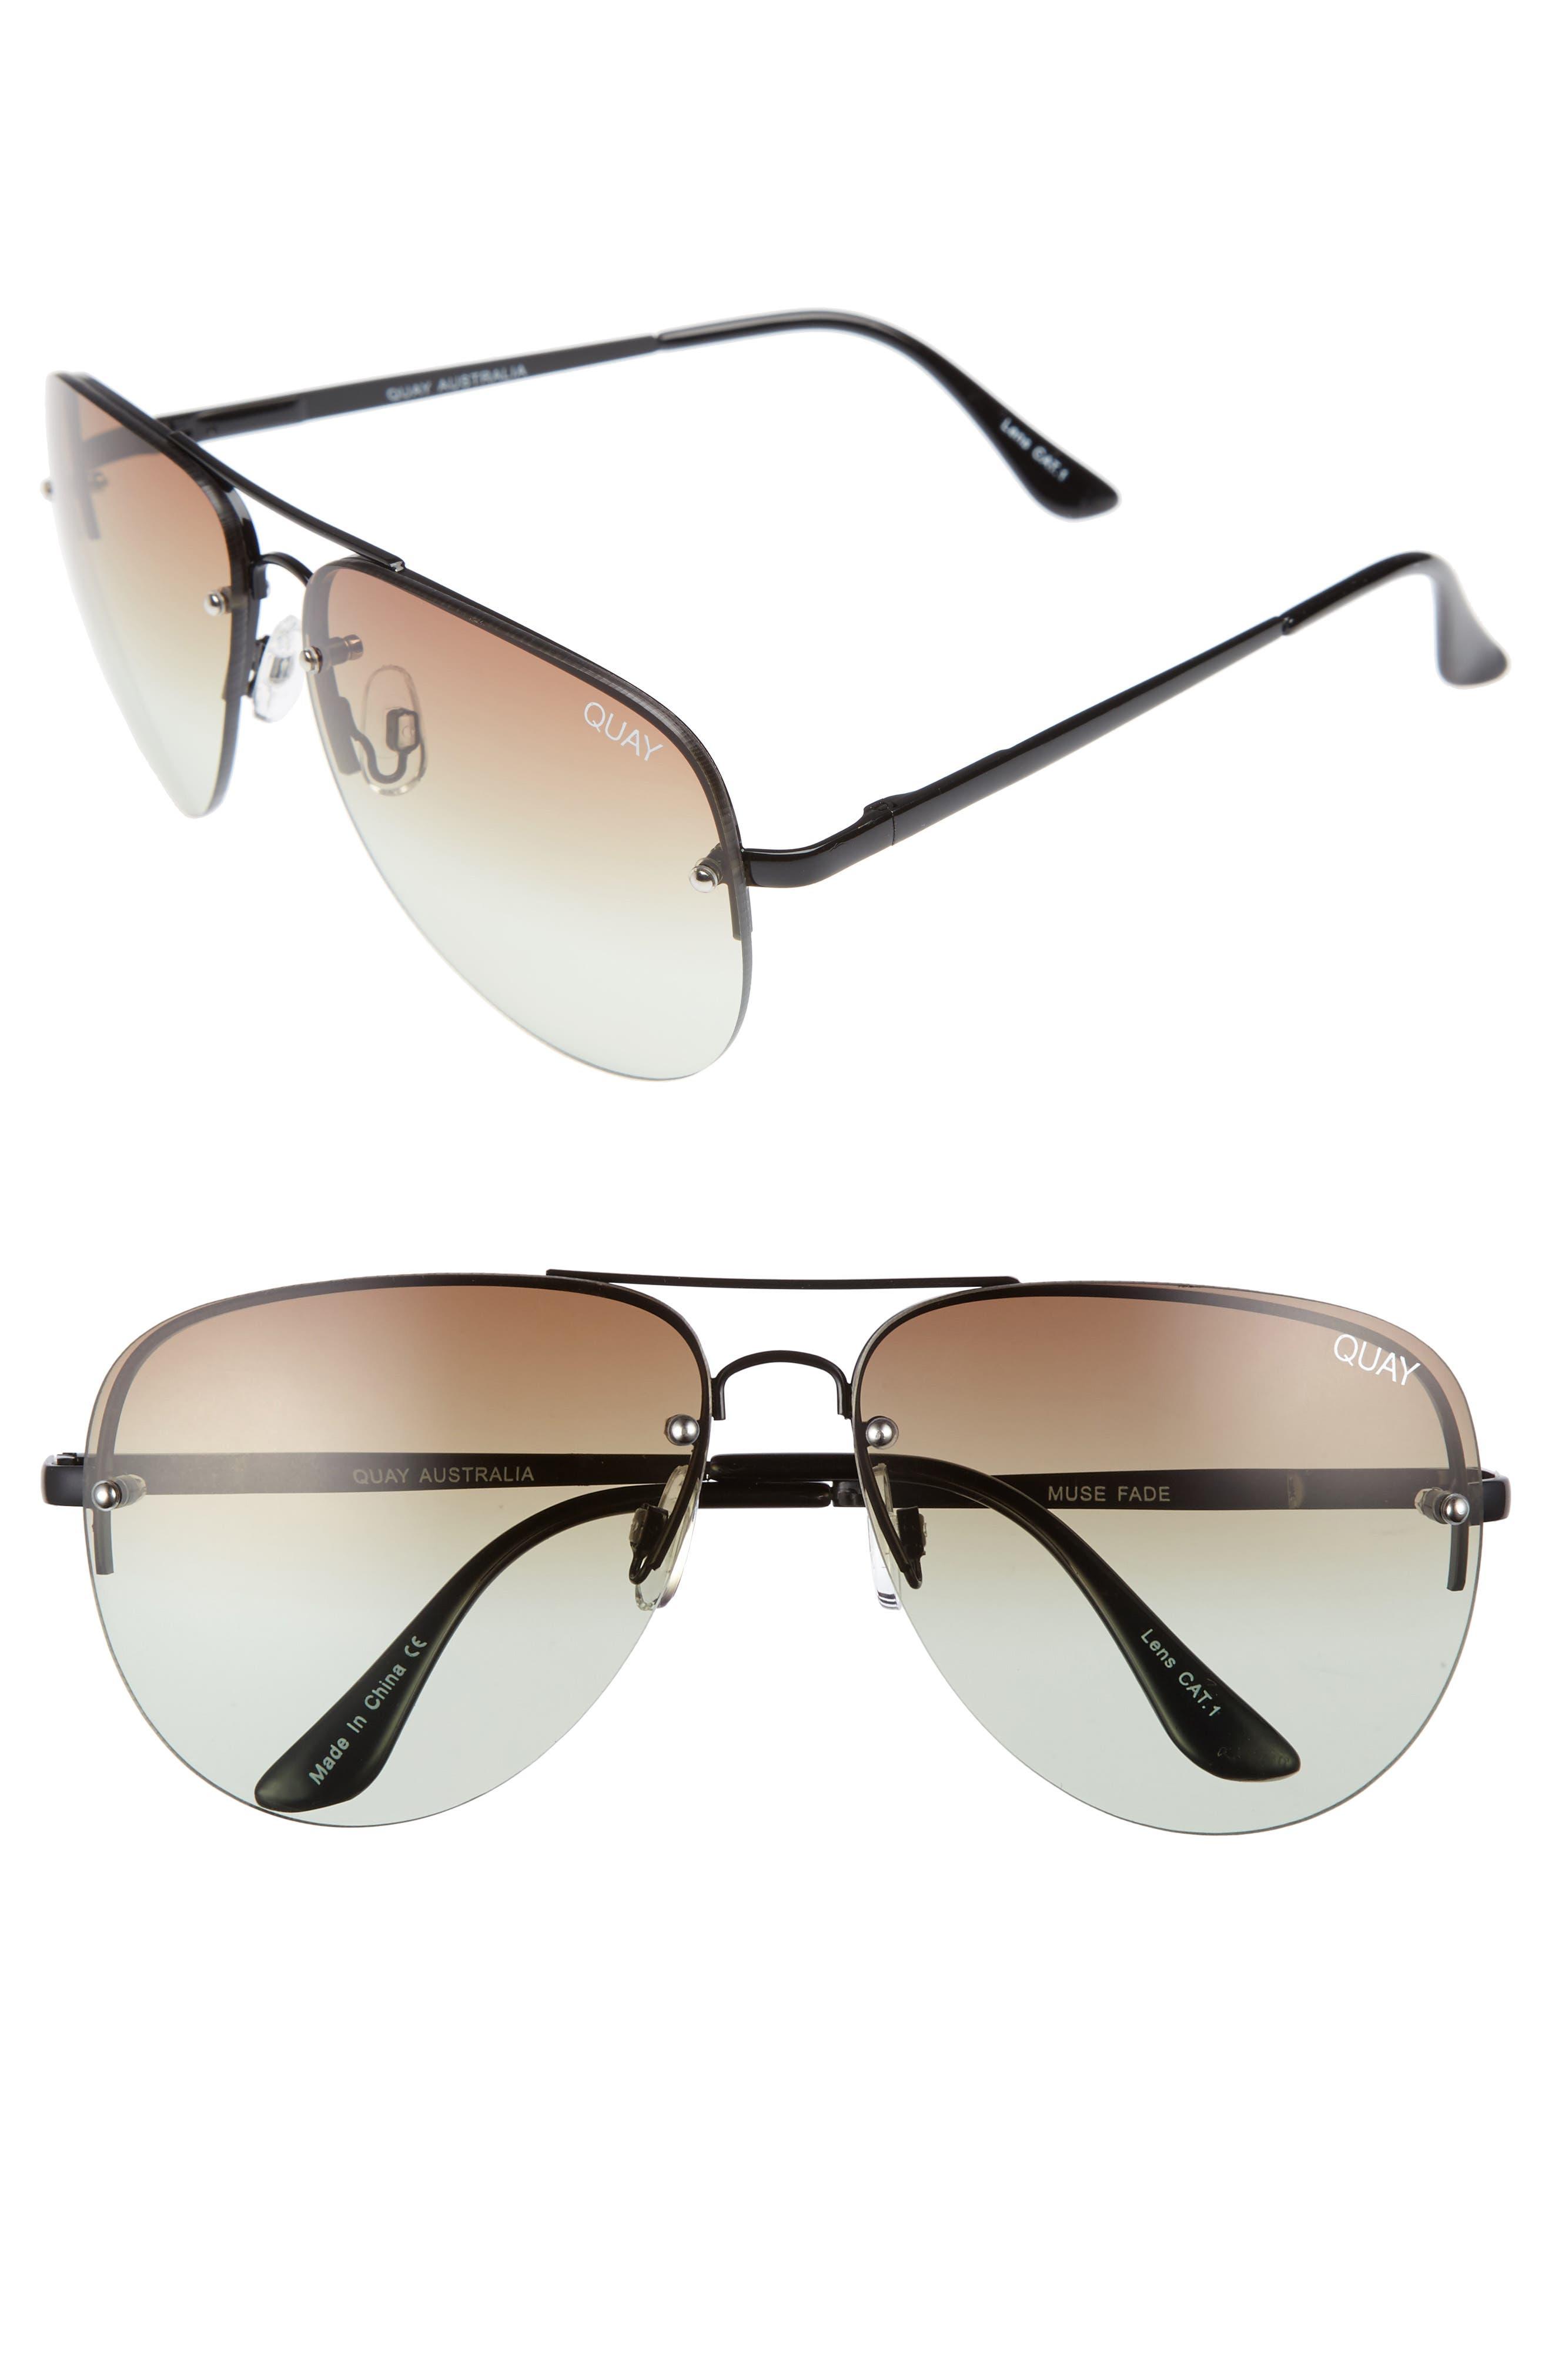 Main Image - Quay Australia Muse Fade 62mm Aviator Sunglasses